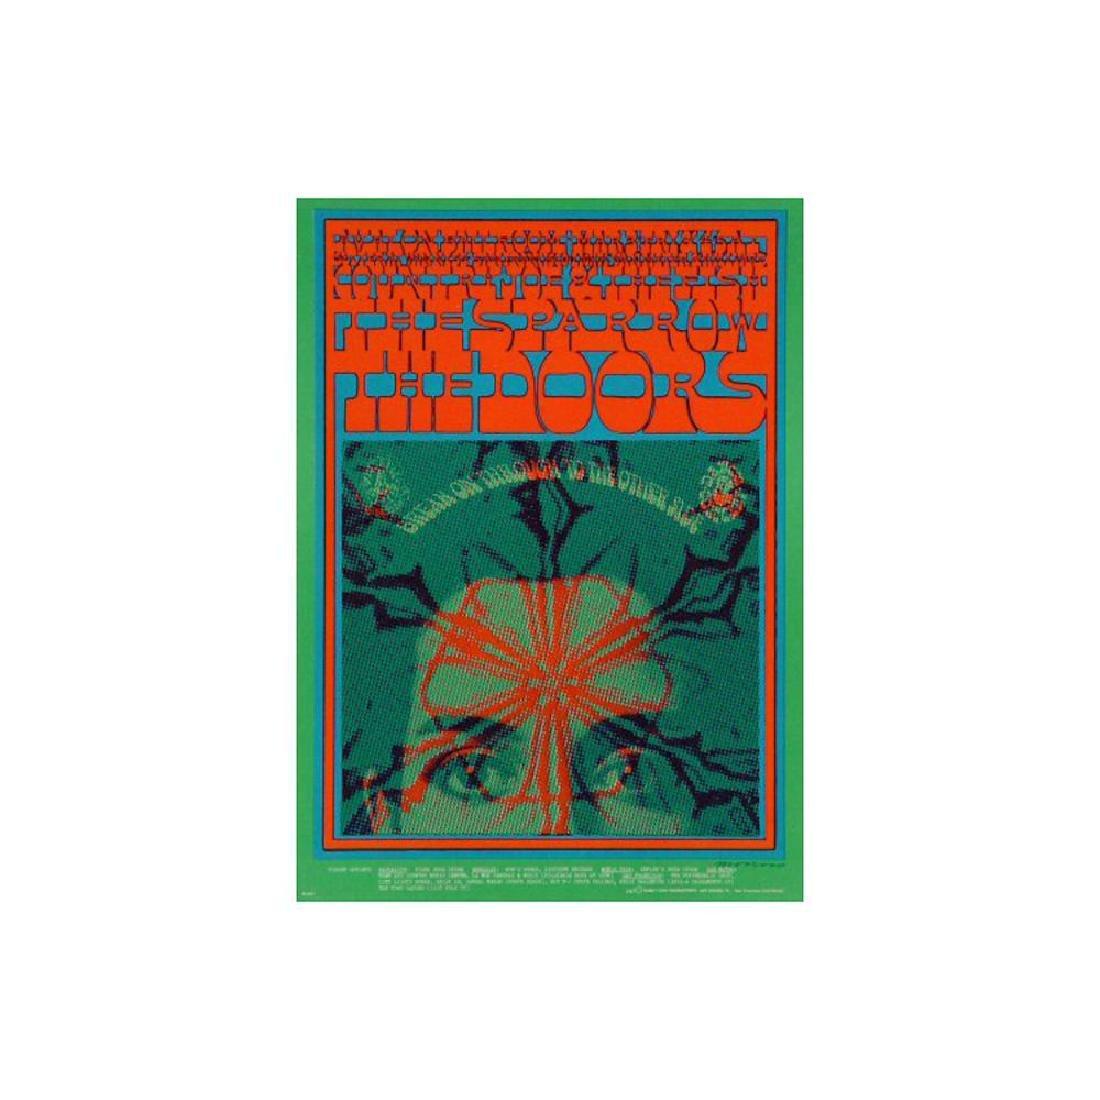 42x60cm-Kein Rahmen cgsmvp EIS Hot Dog Carl Barks Gold Coupons Malerei Leinwand /Öldruck Poster Wandkunst HD Bild f/ür Wohnzimmer Home Decoration